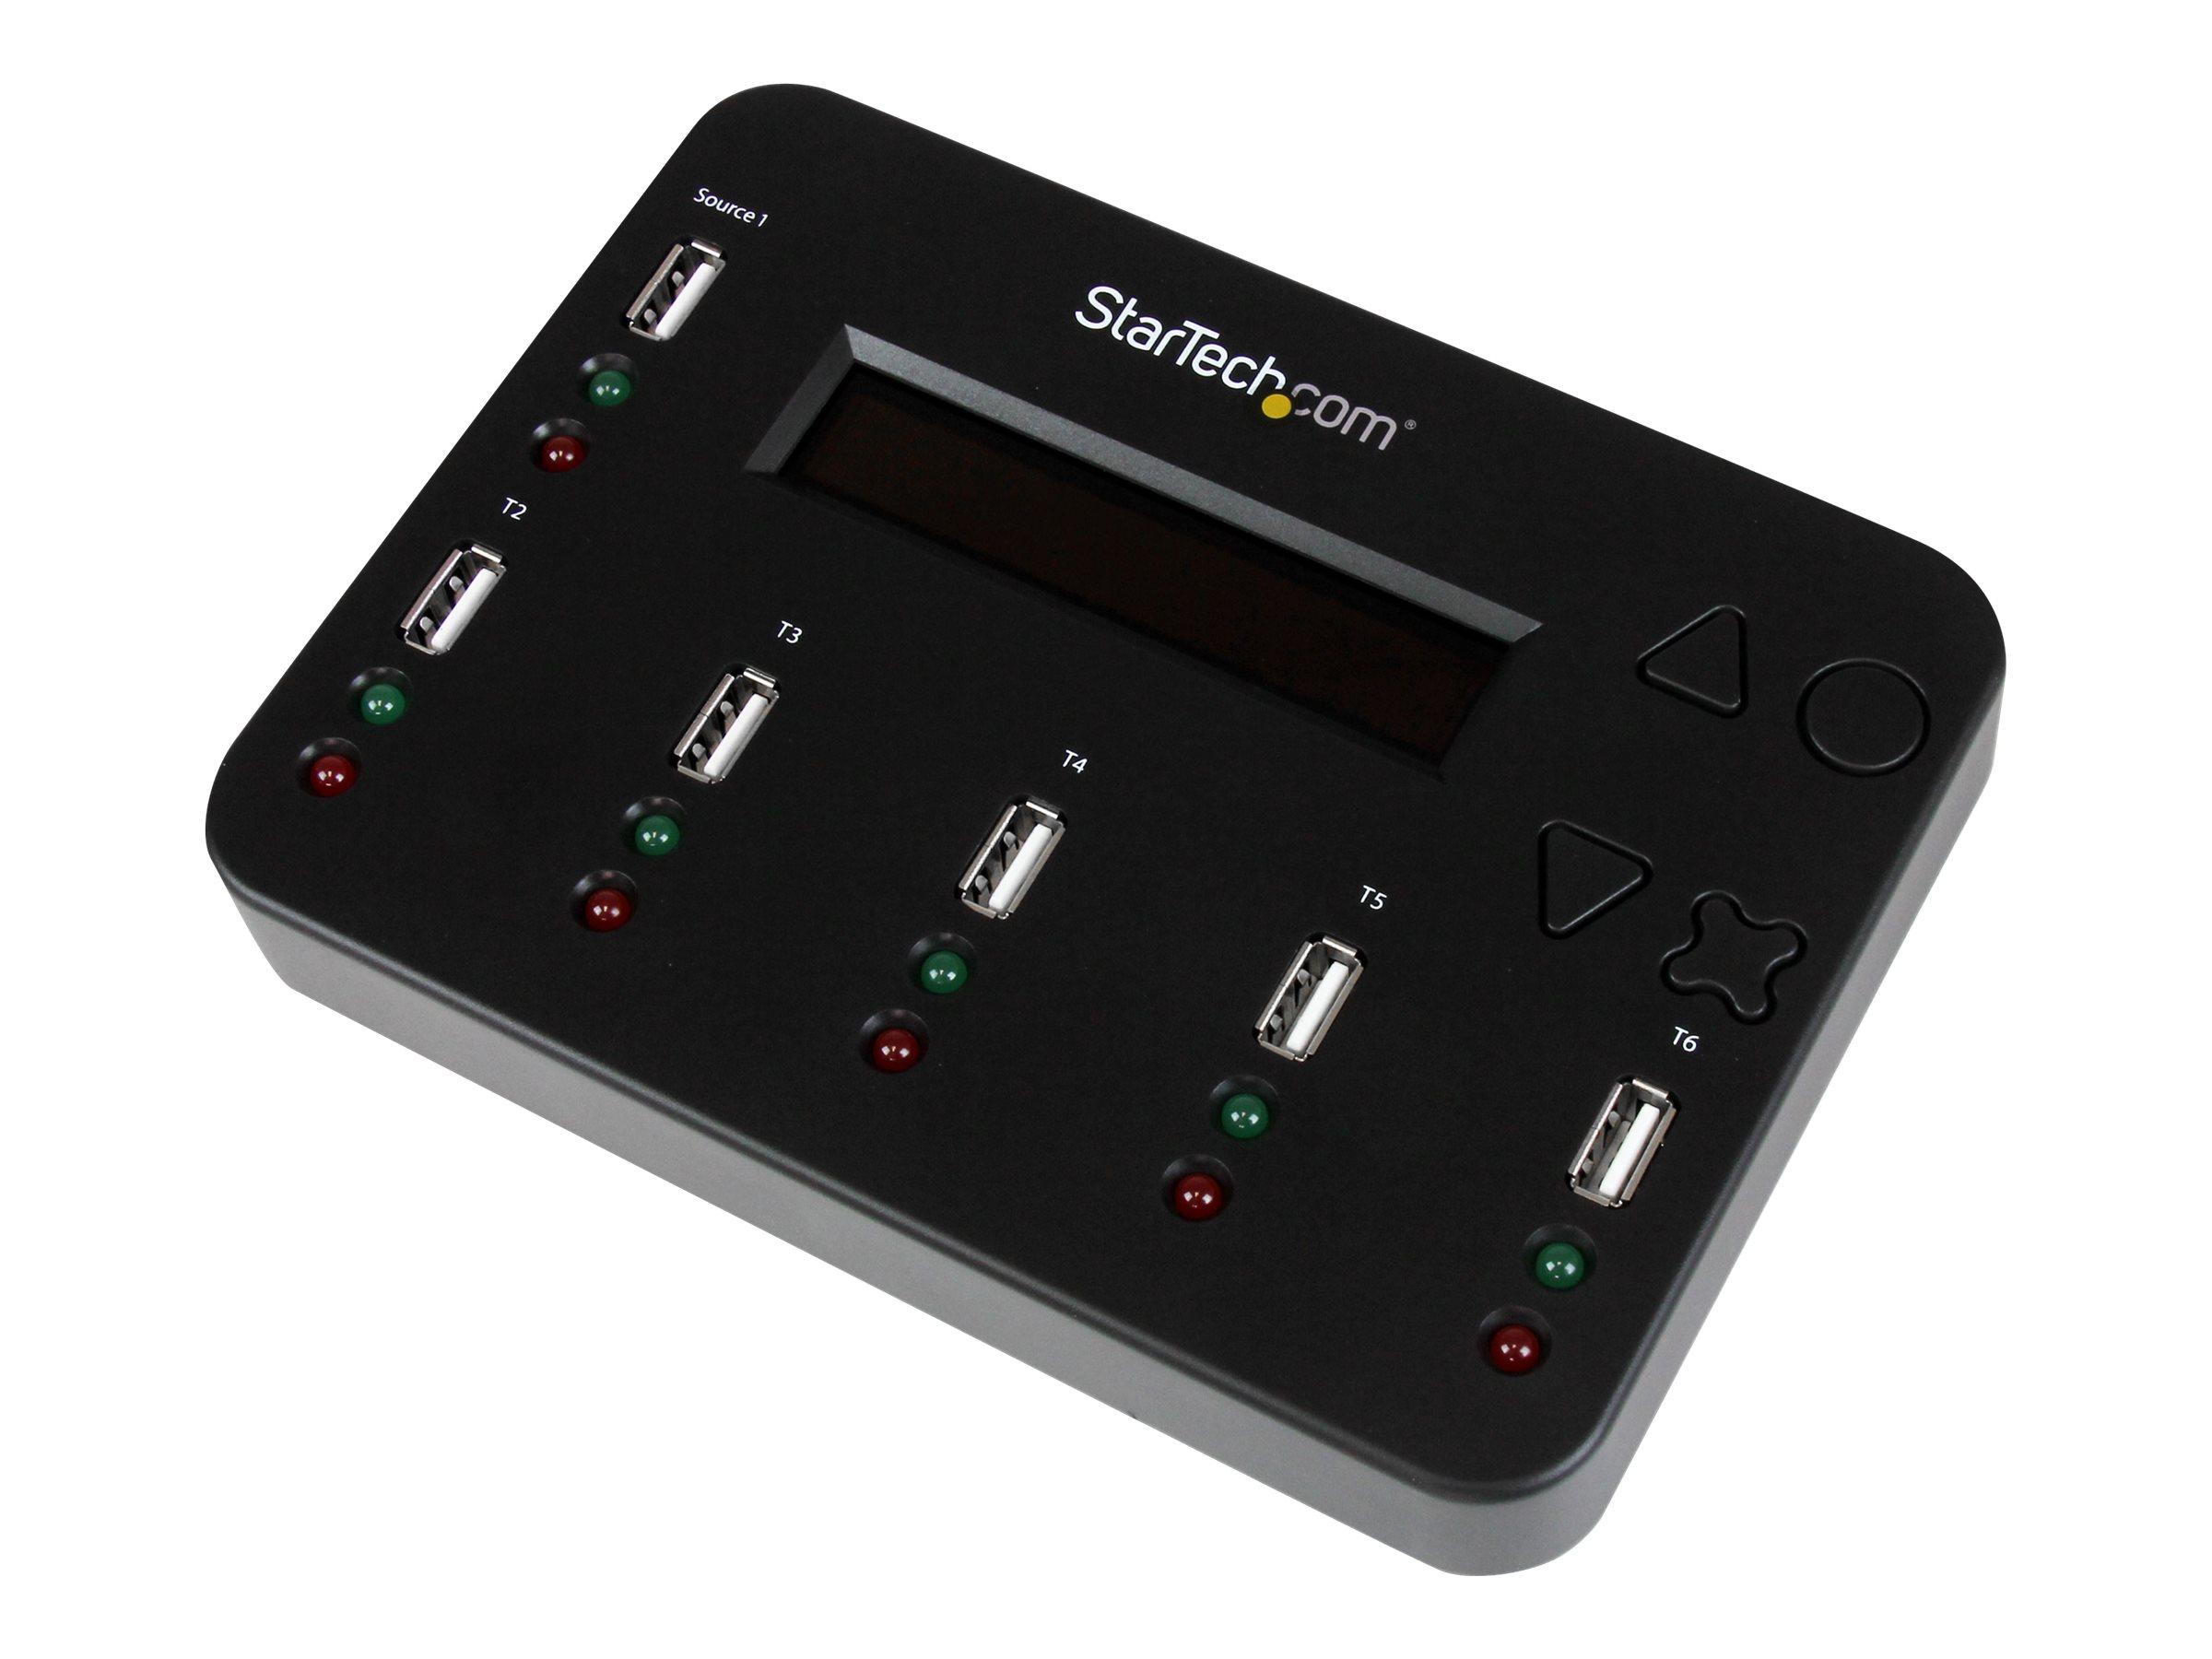 StarTech.com 1:5 Standalone USB Flash Drive Duplikator und Eraser-1 zu 5 Flash Drive Kopierer & Sanitizer - USB-Disk-Duplikator